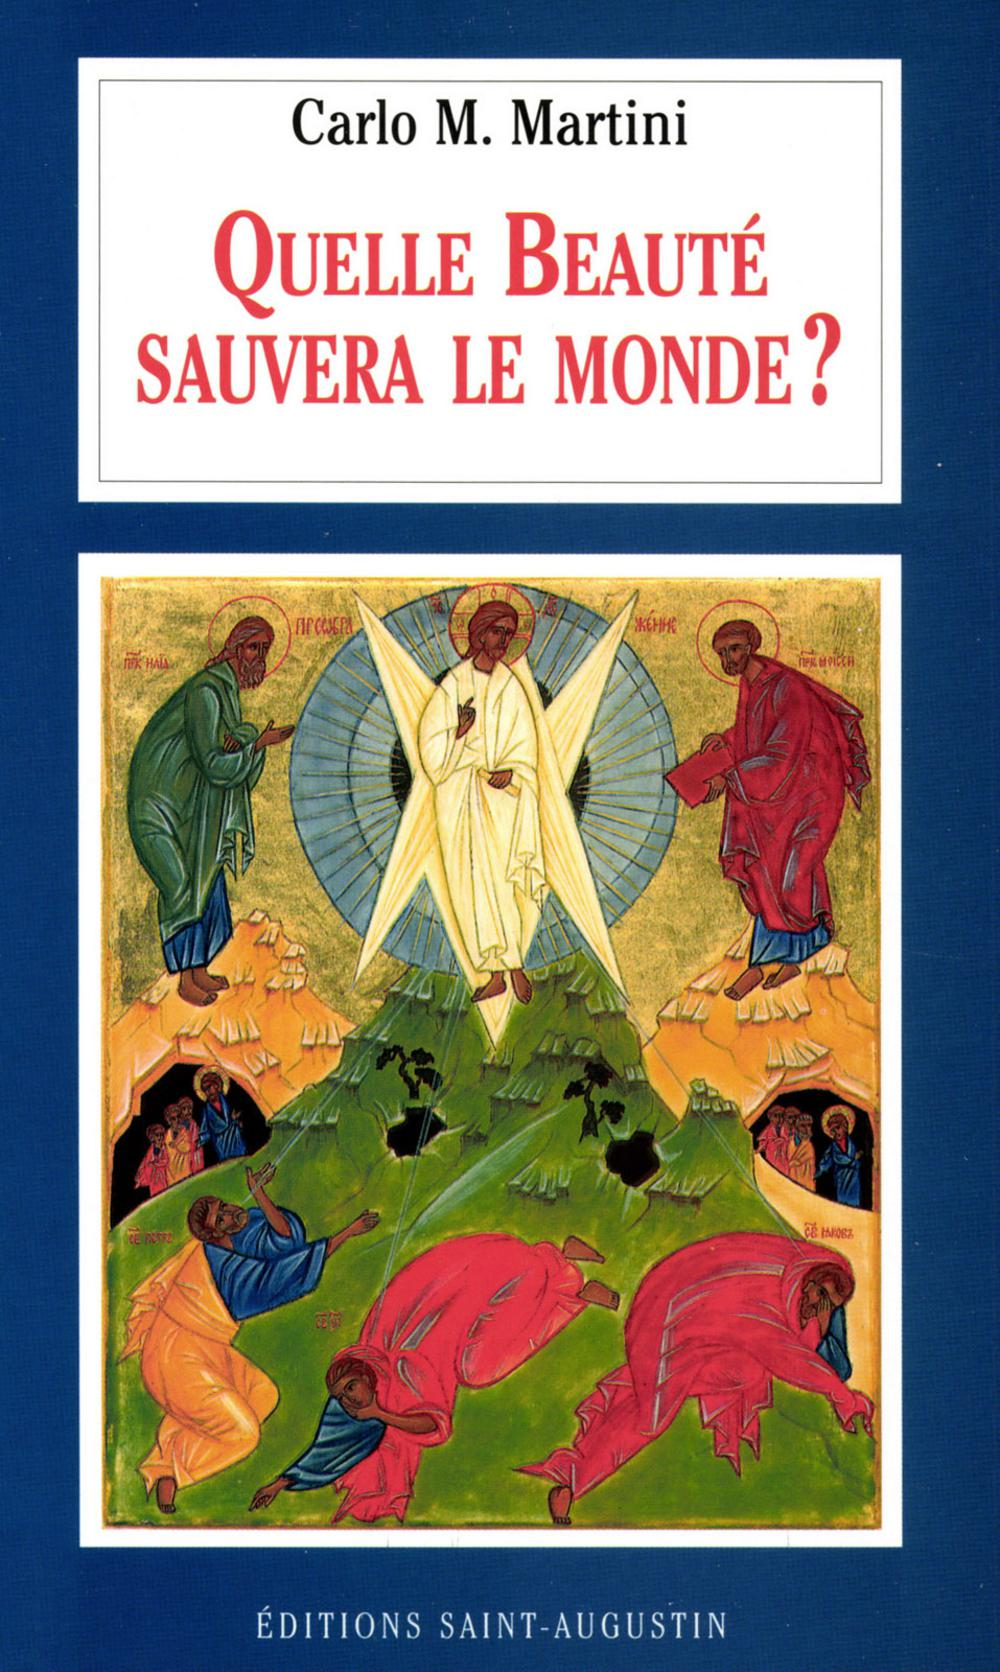 Carlo Maria Martini Quelle beauté sauvera le monde?